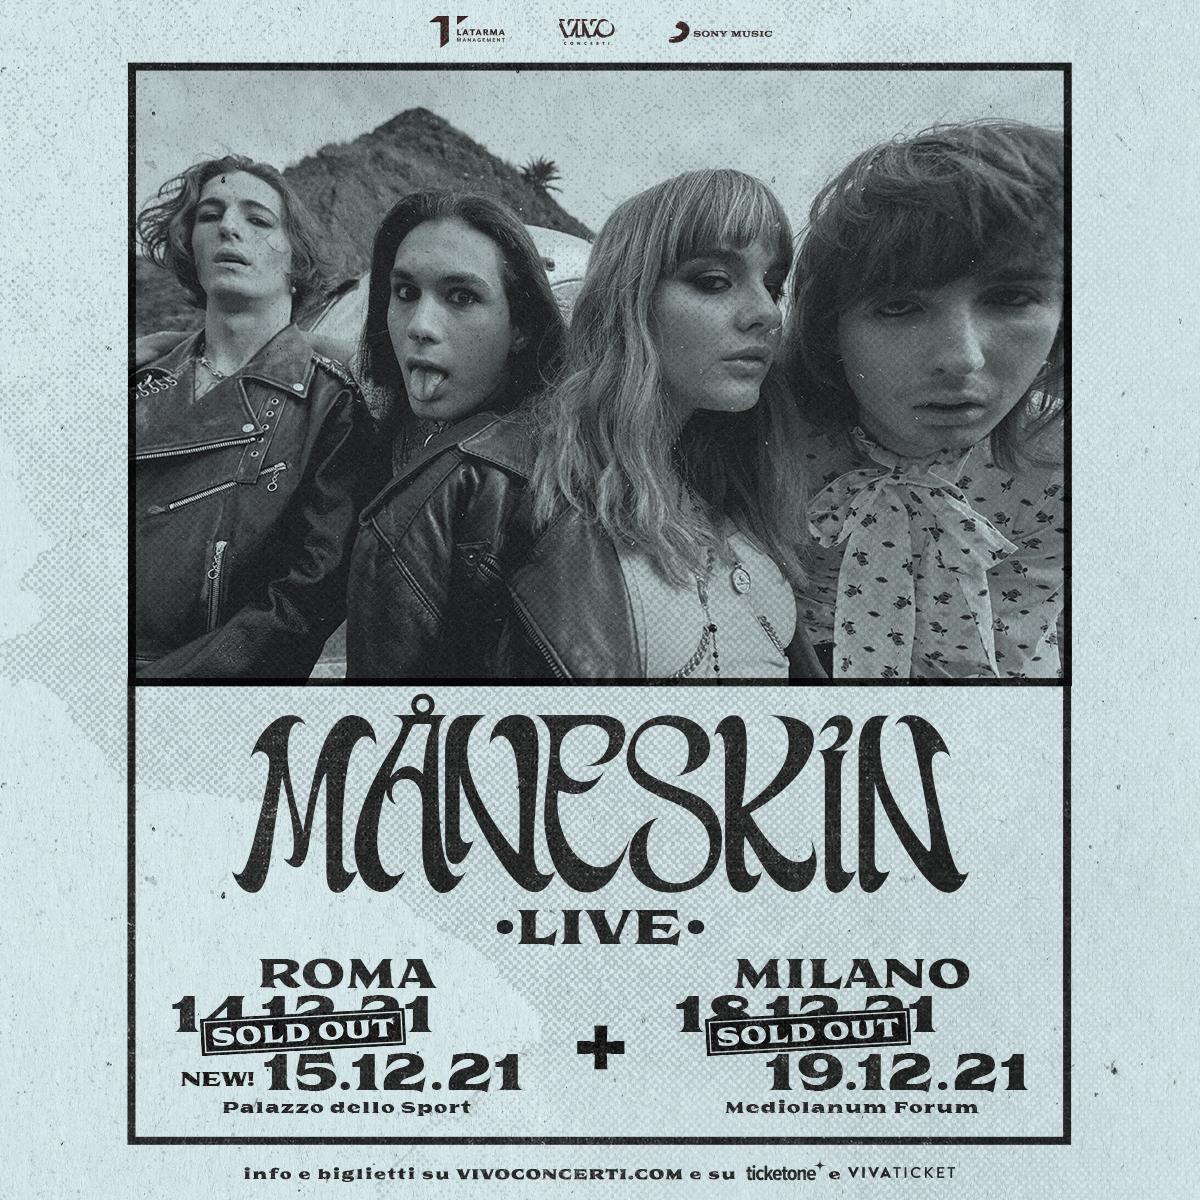 MÅNESKIN TOUR 2021